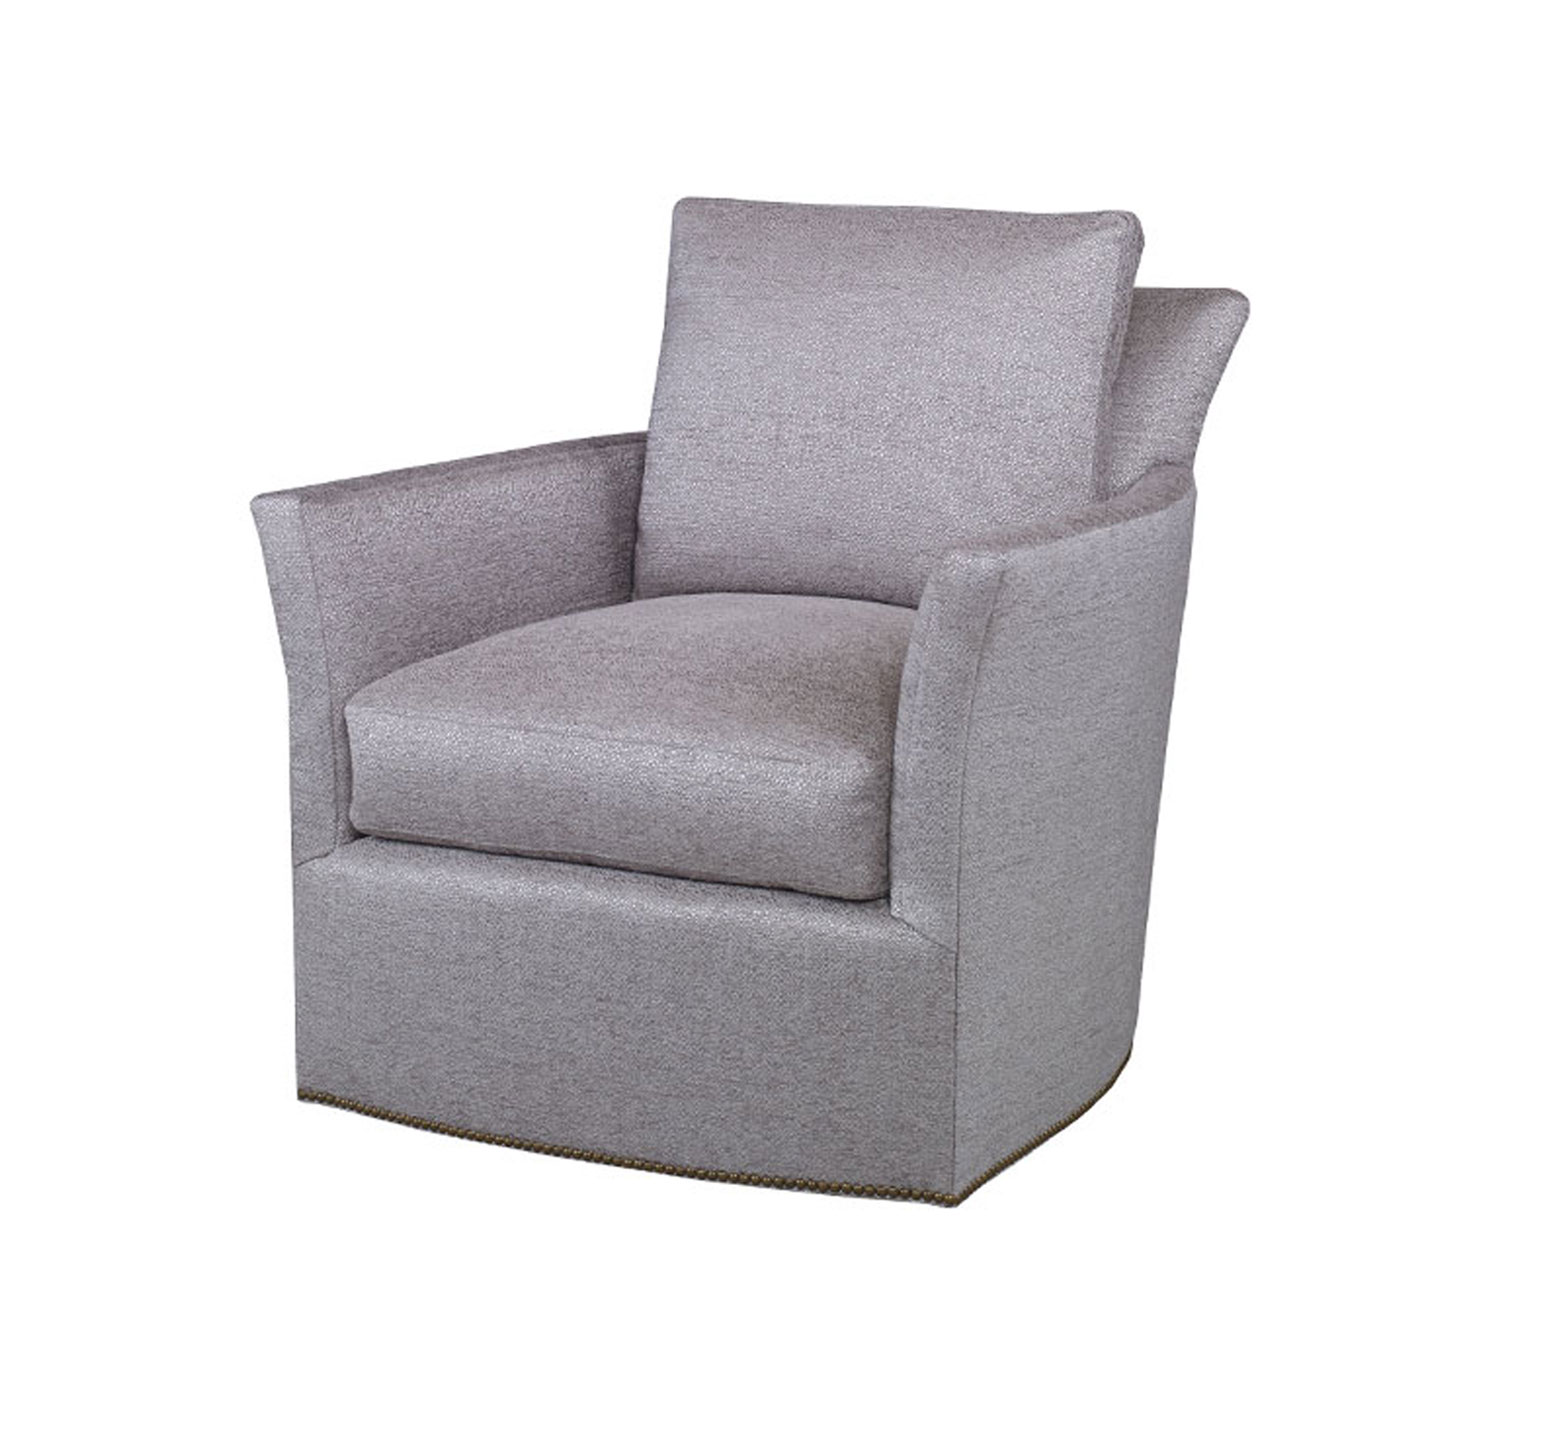 Pair of Trent Swivel Chairs